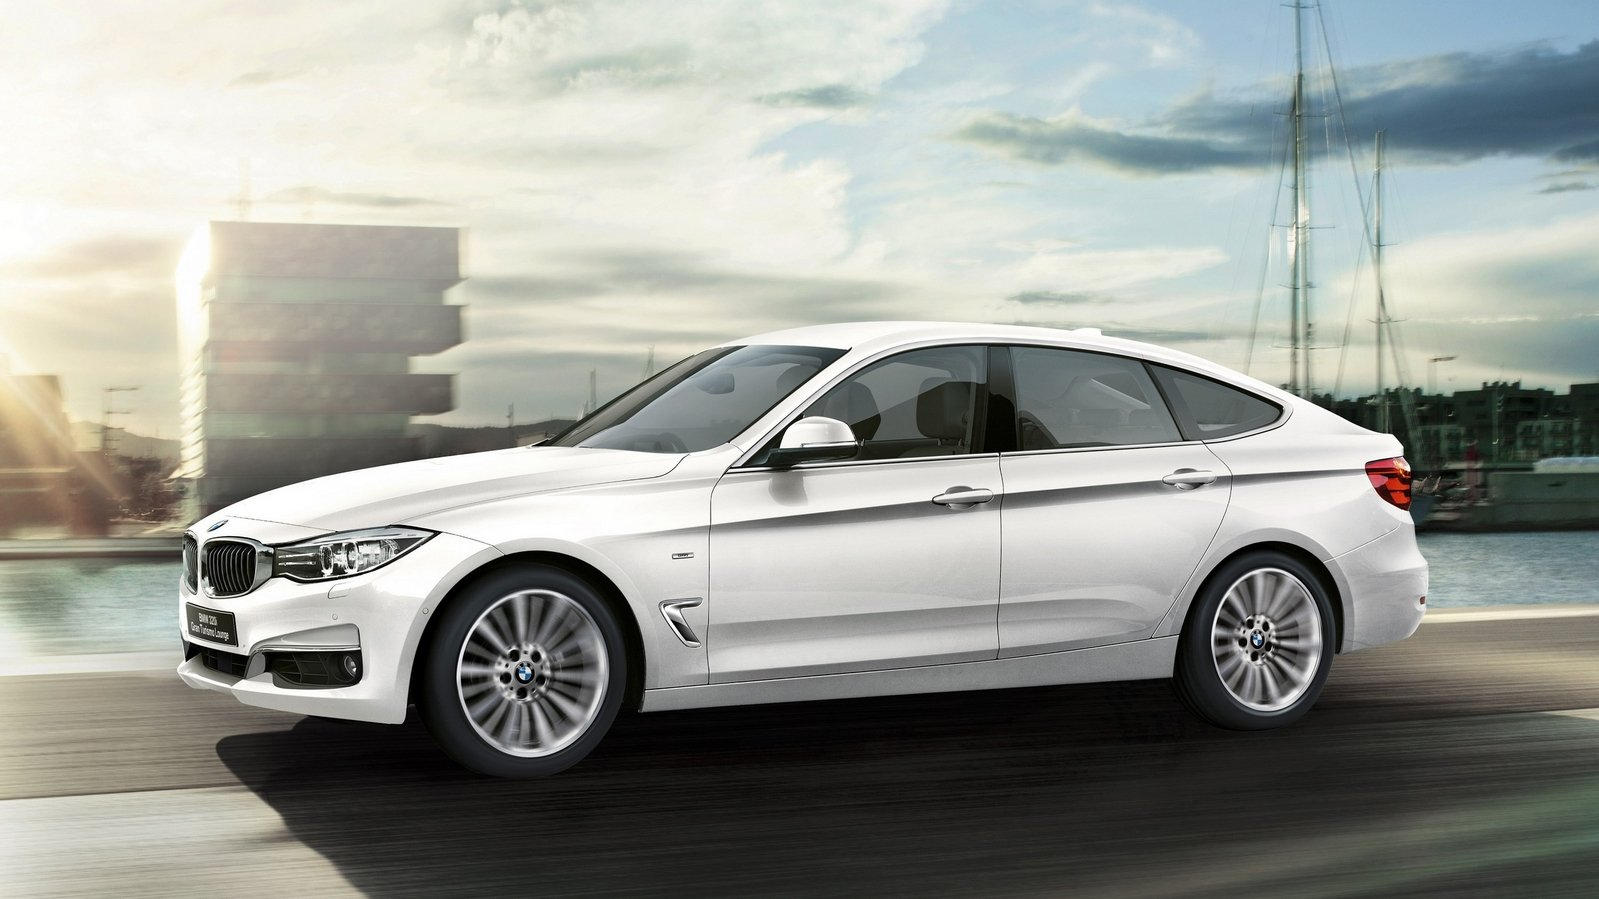 Bmw 3 Series Gran Turismo Luxury Lounge Edition